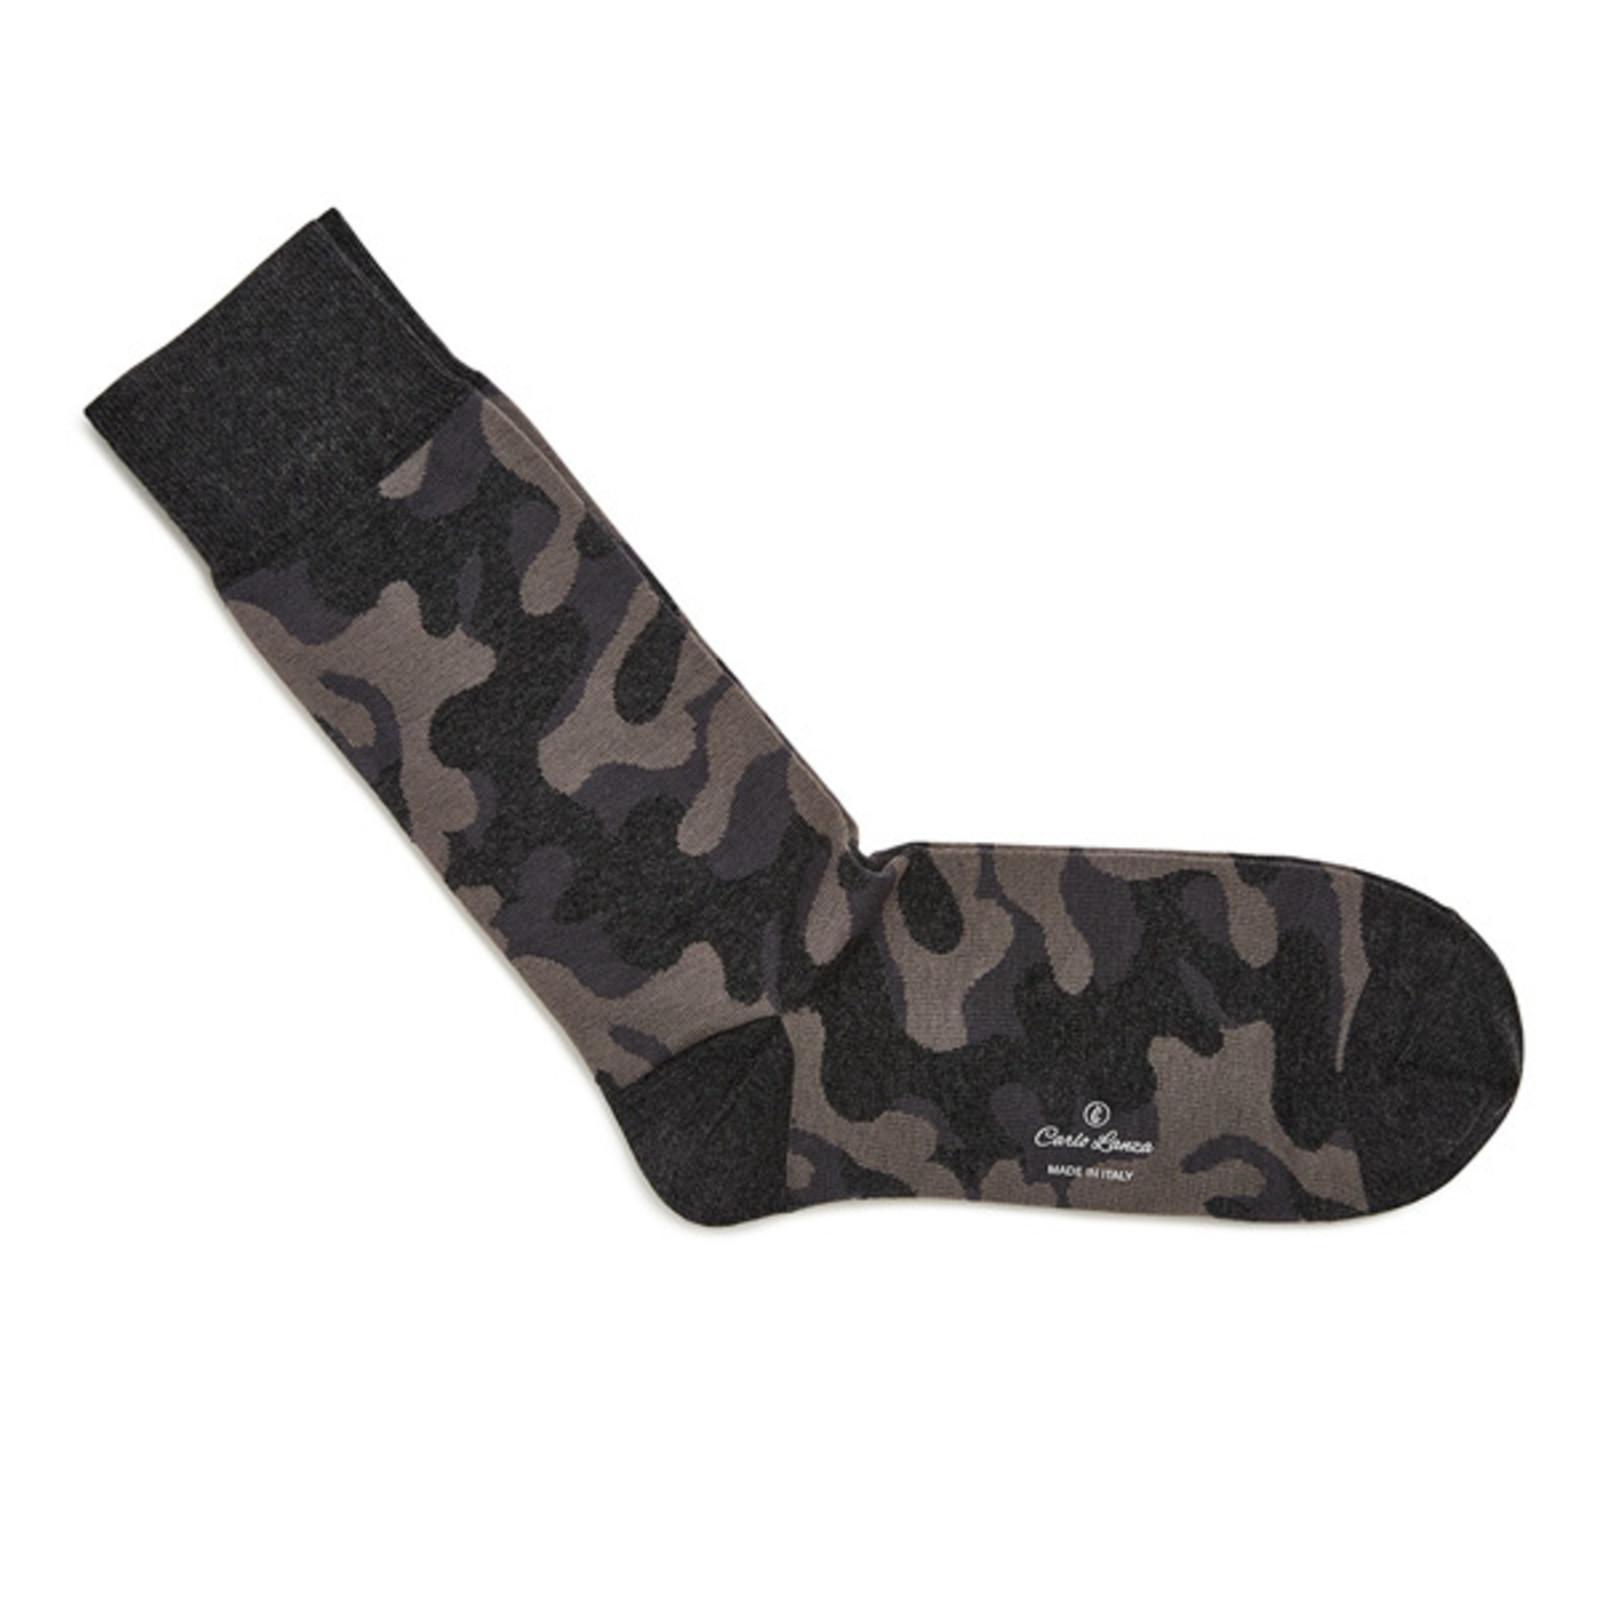 Carlo Lanza Grey camouflage socks